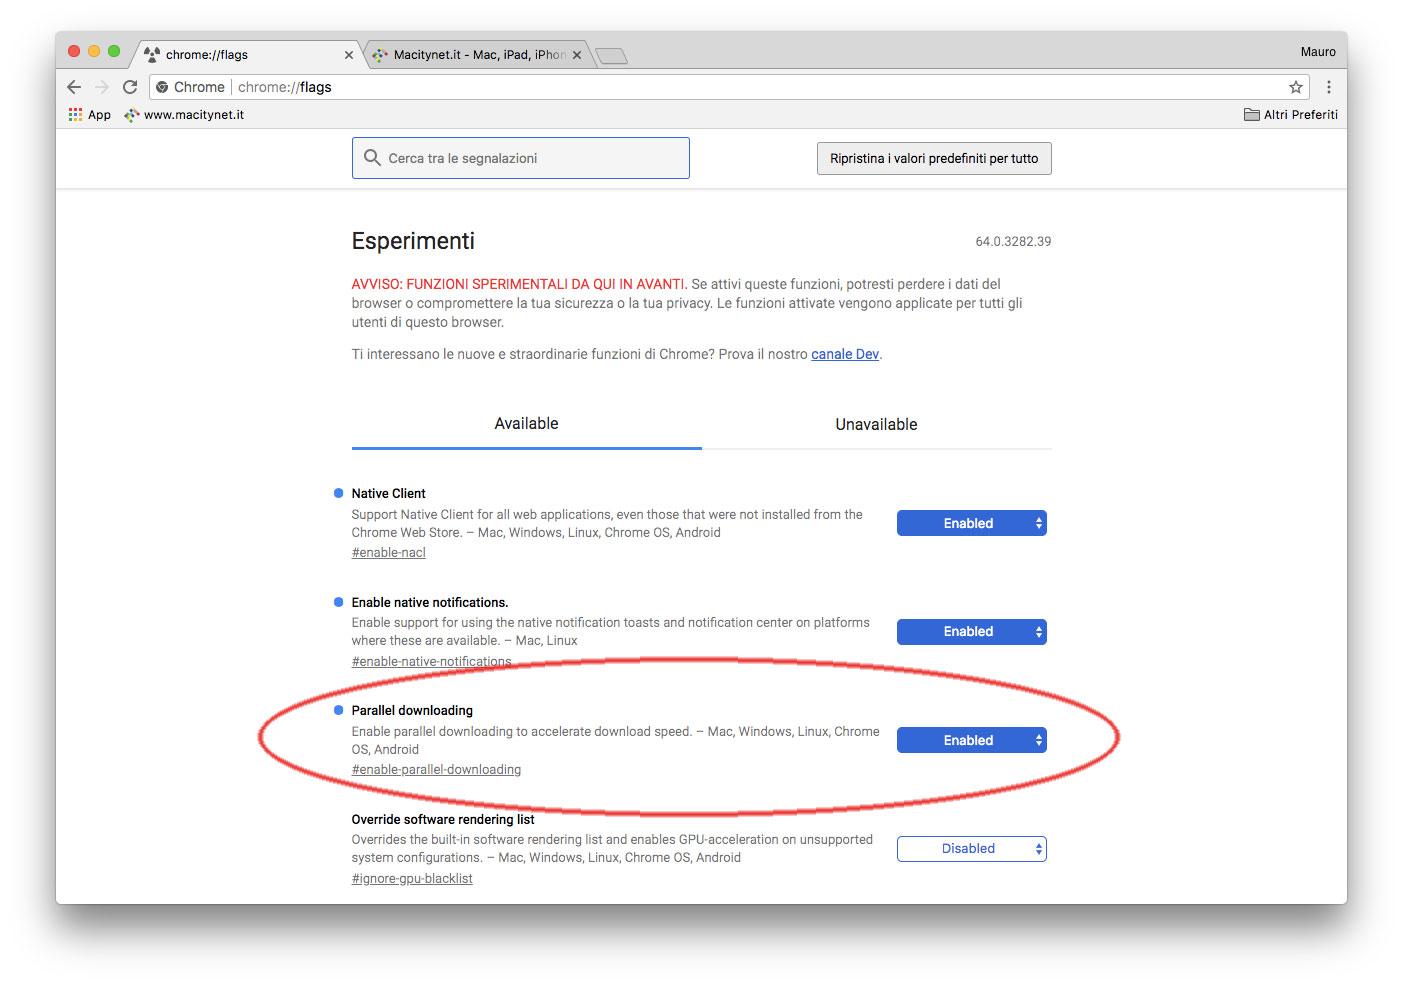 In Chrome 64 download parallelo per scaricare velocissimi - Macitynet it